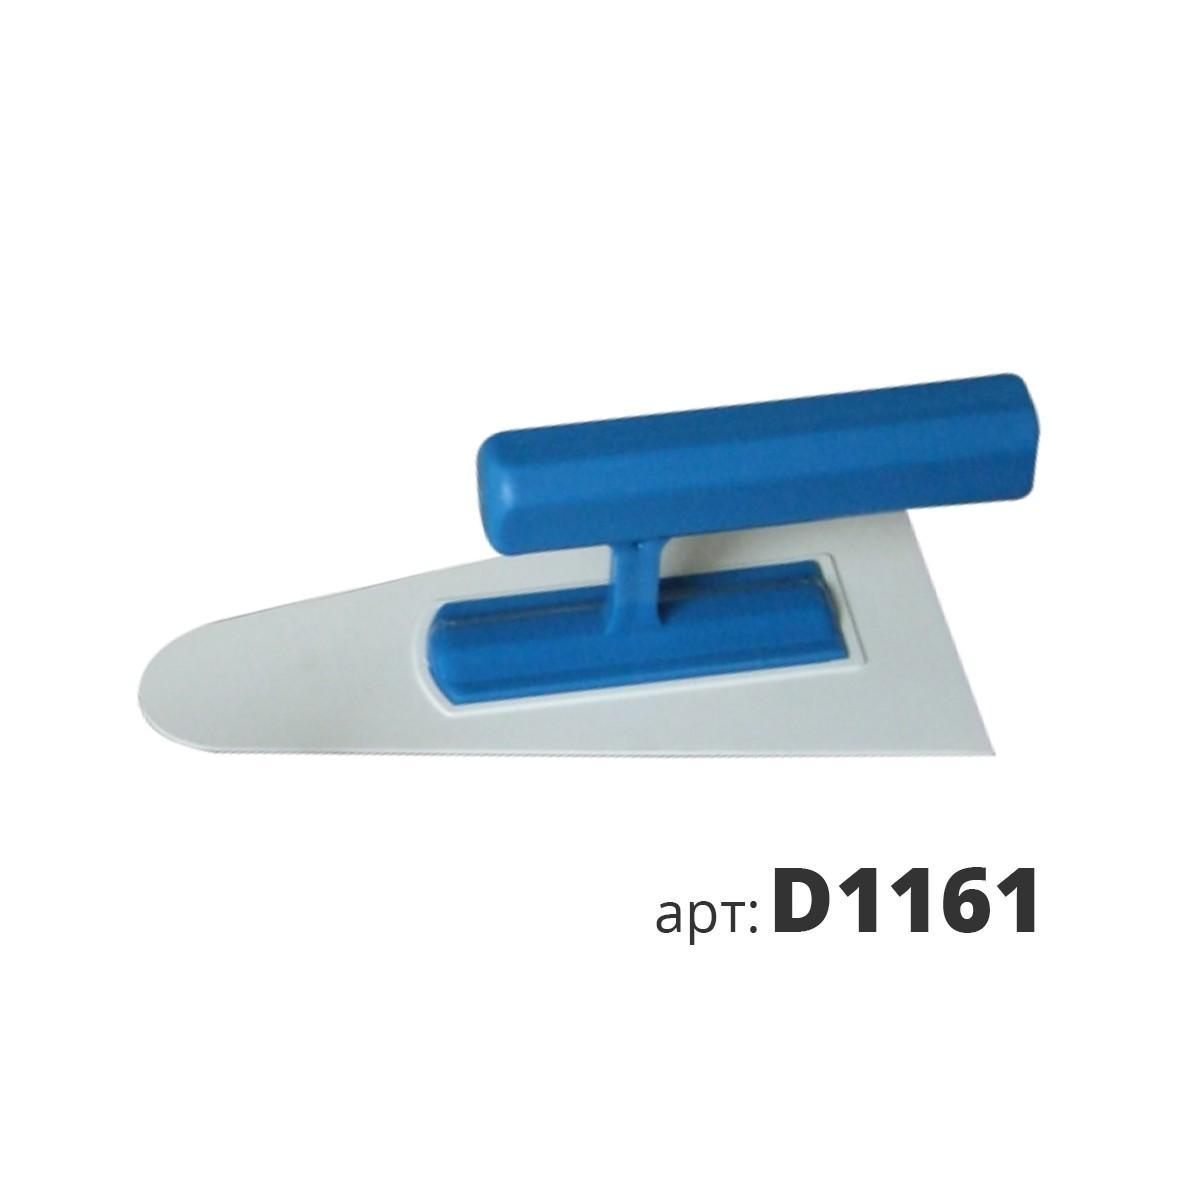 Кельма пластиковая закругленная D116